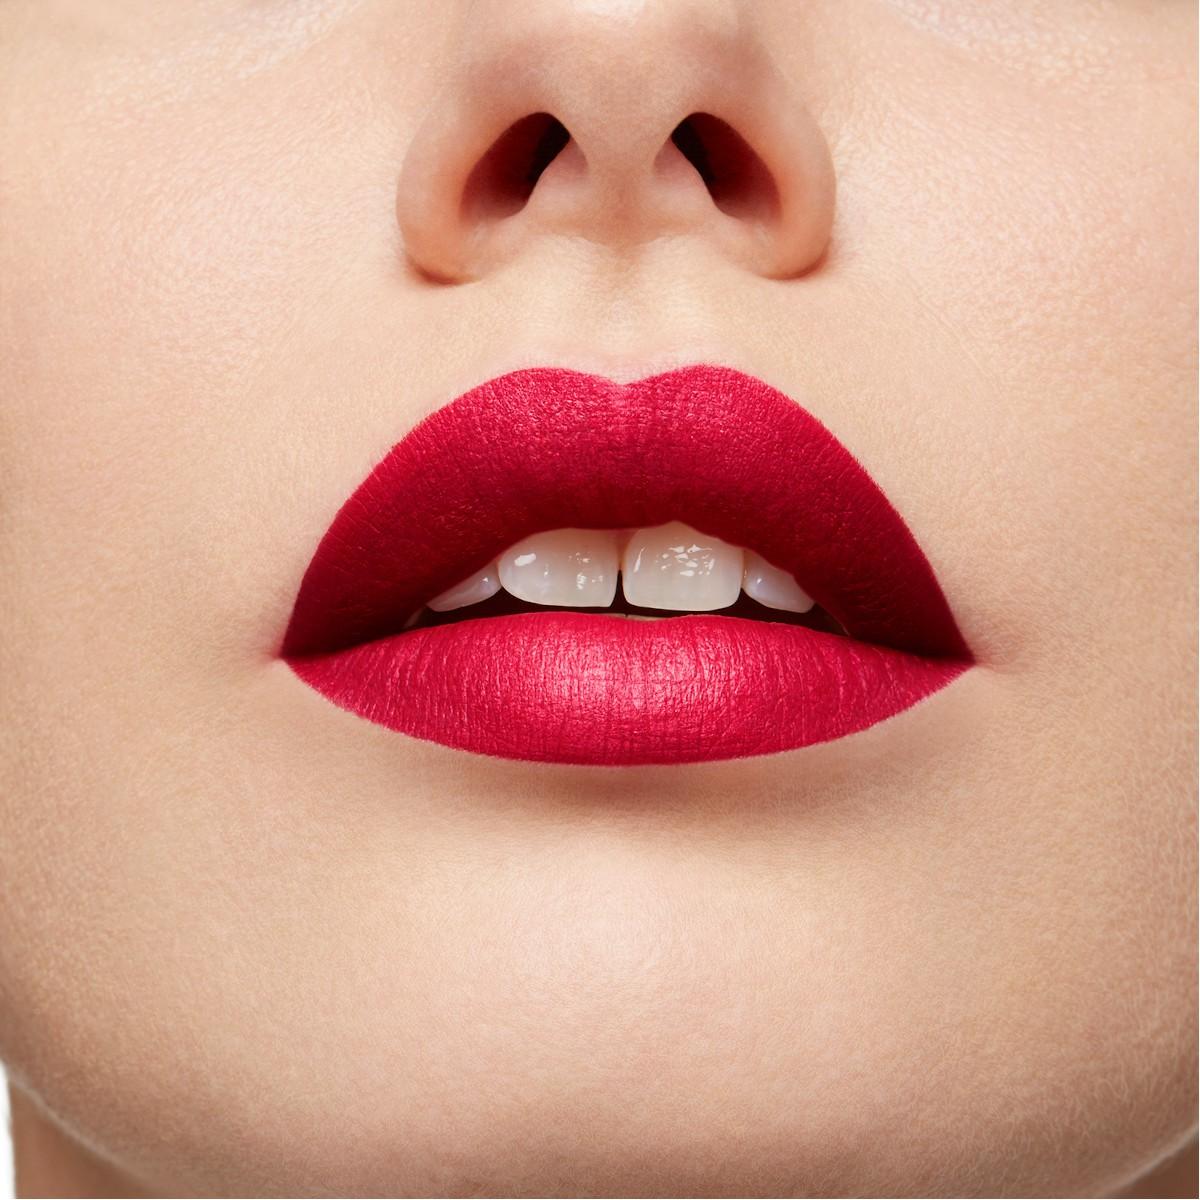 Beauty - Rouge Louboutin - Christian Louboutin